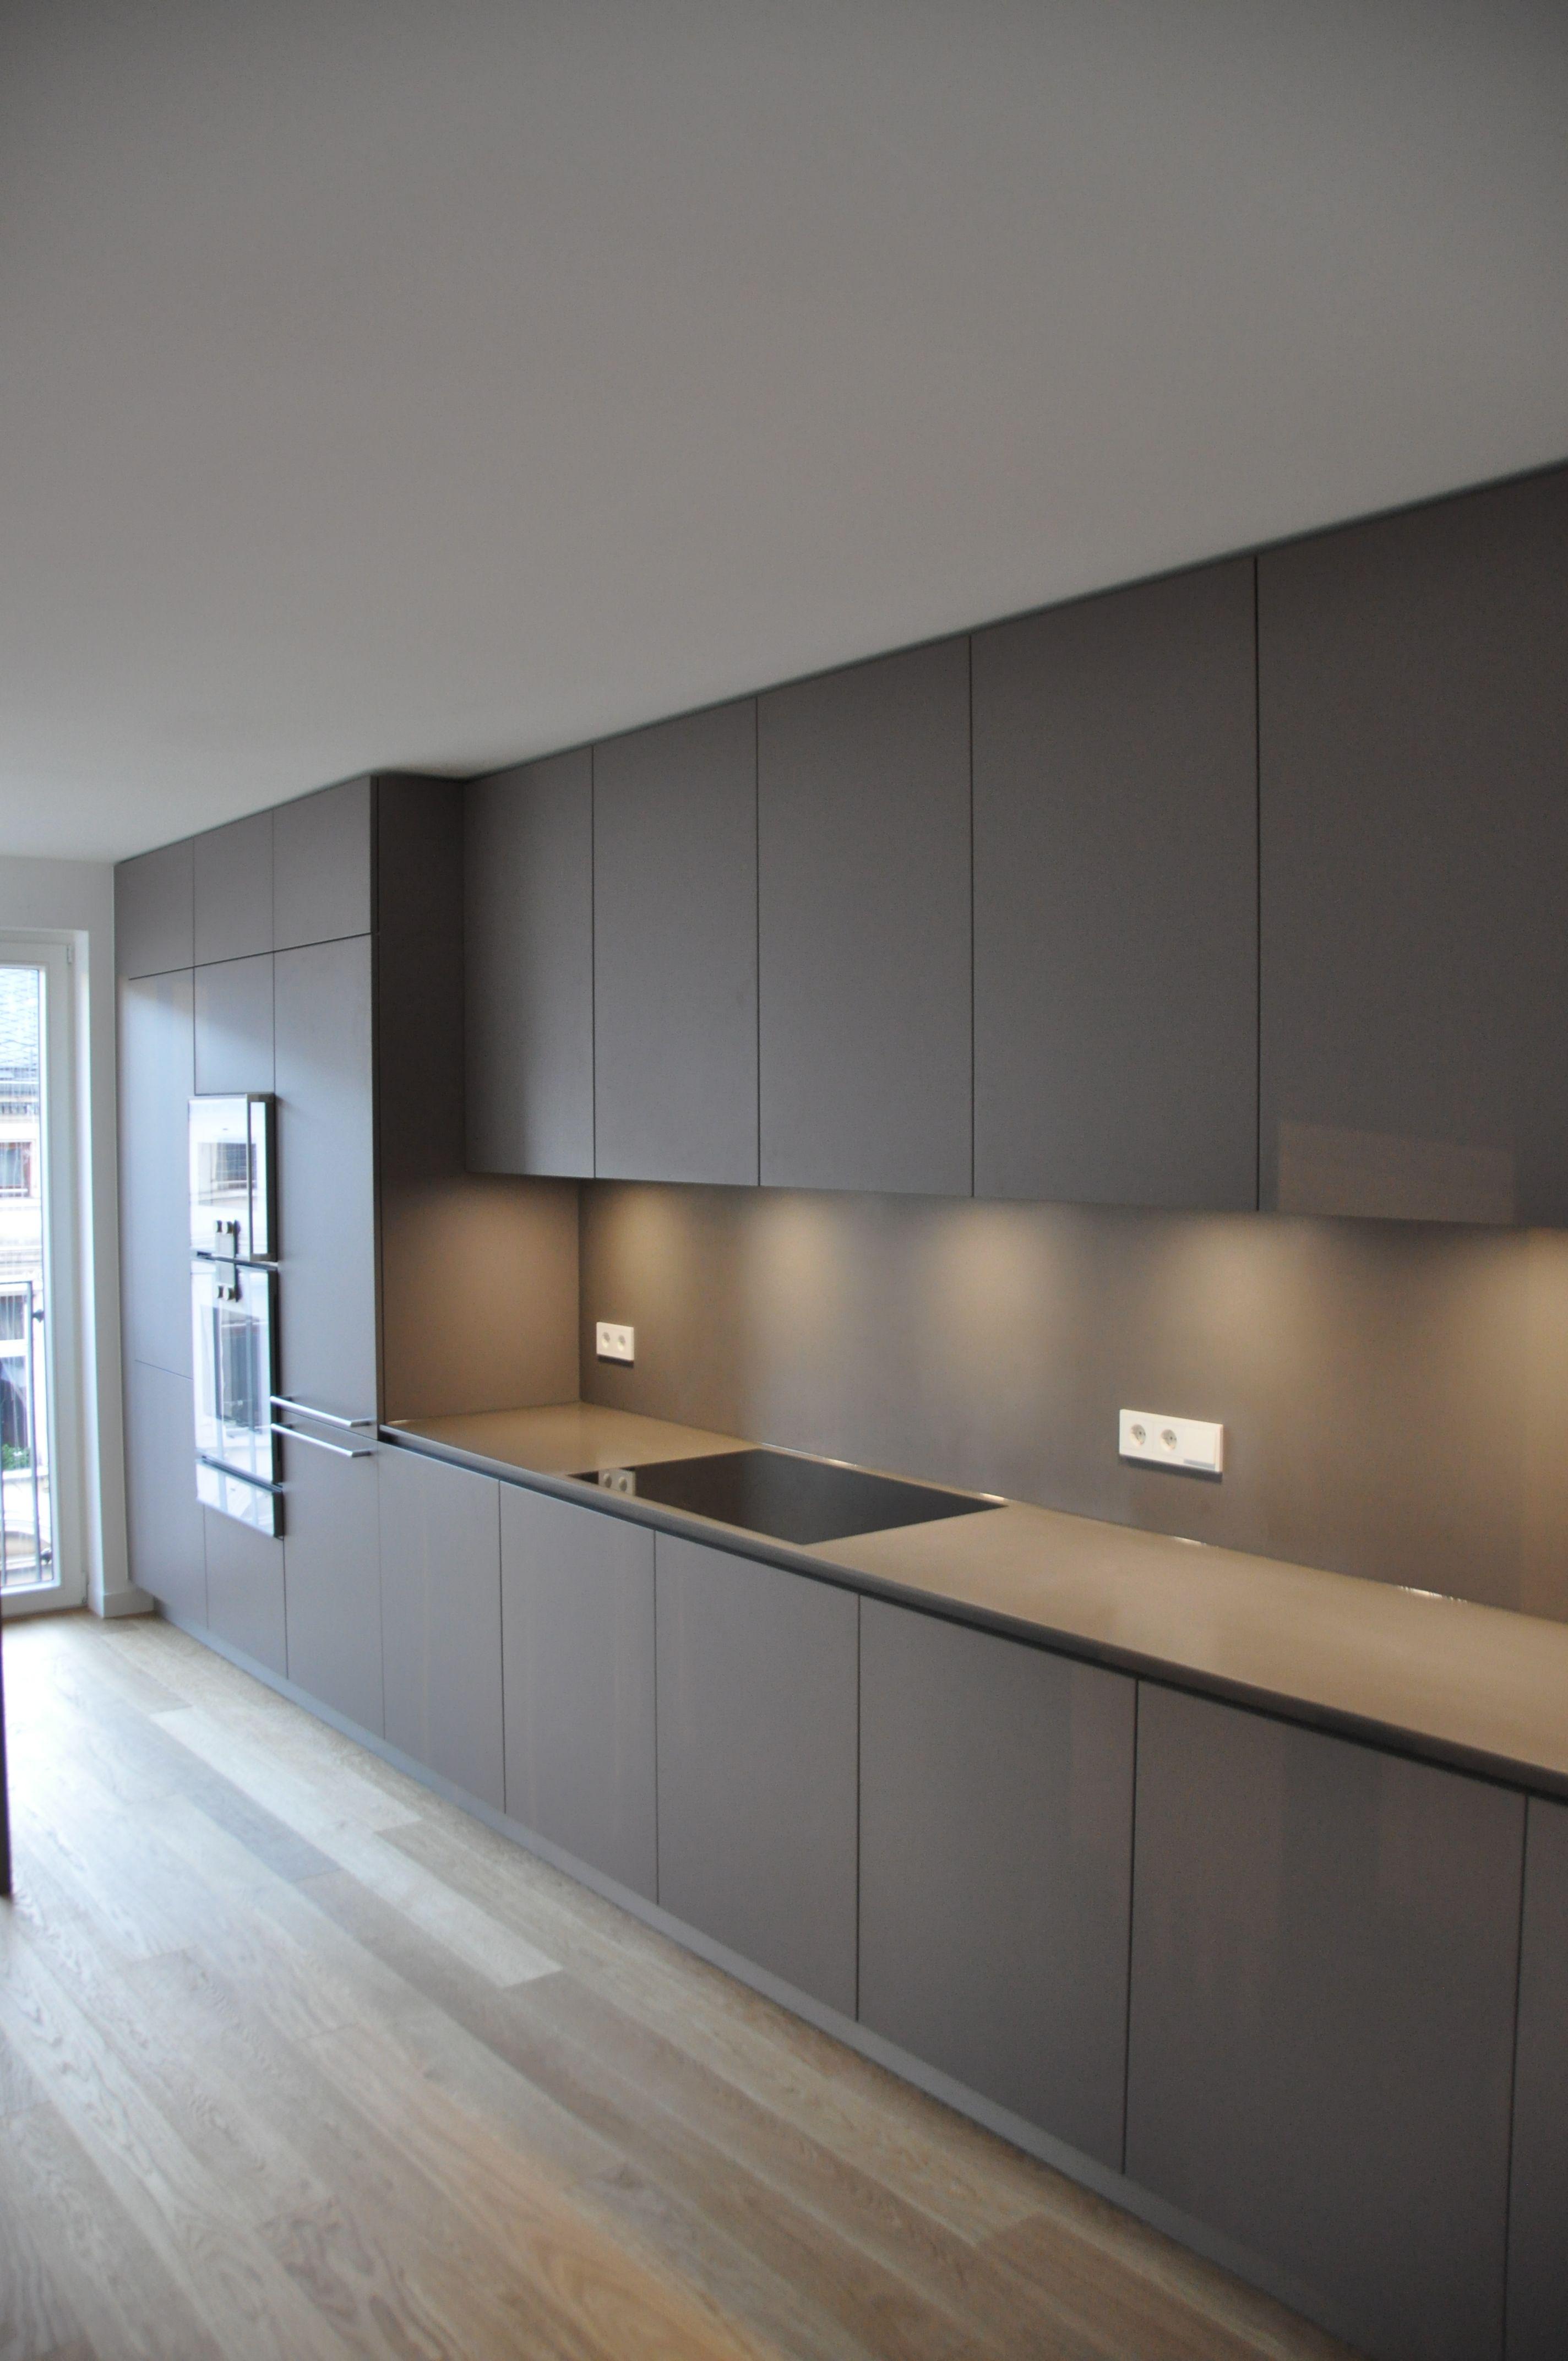 arbeitsplatte k che taupe materialkundig k che pinterest. Black Bedroom Furniture Sets. Home Design Ideas